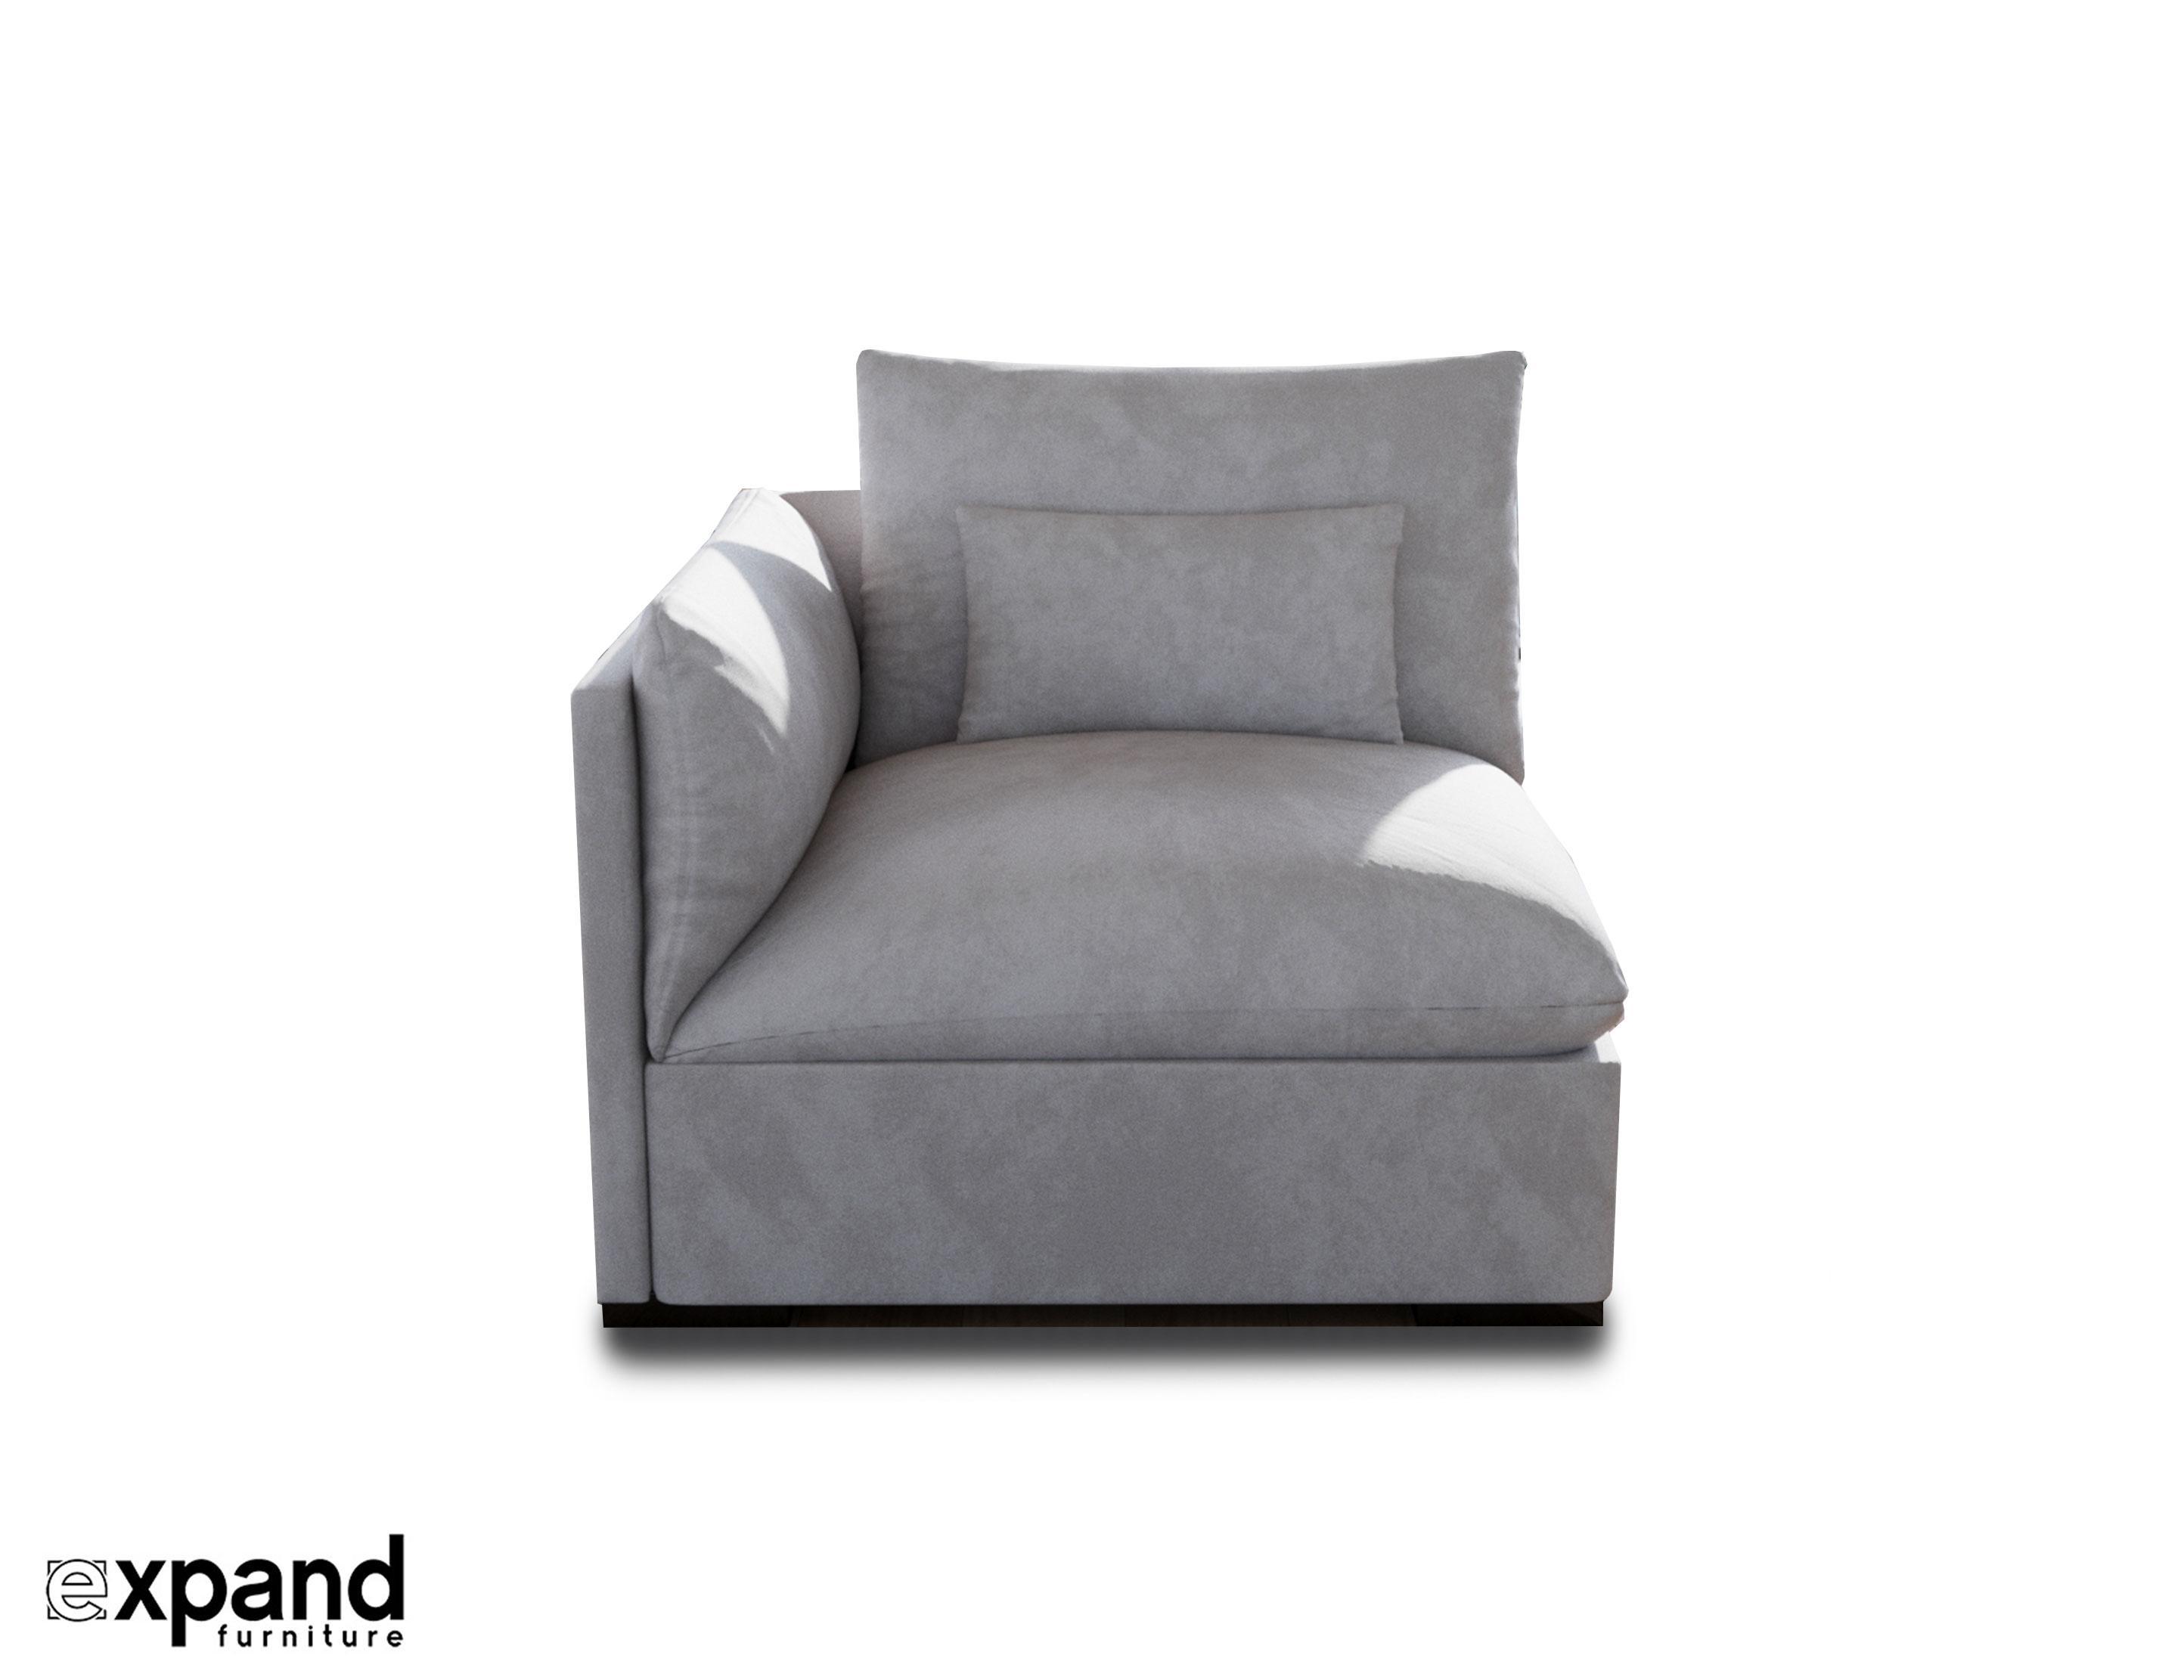 Adagio: Corner Luxury Sofa Module | Expand Furniture – Folding With High End Sofa (View 19 of 20)